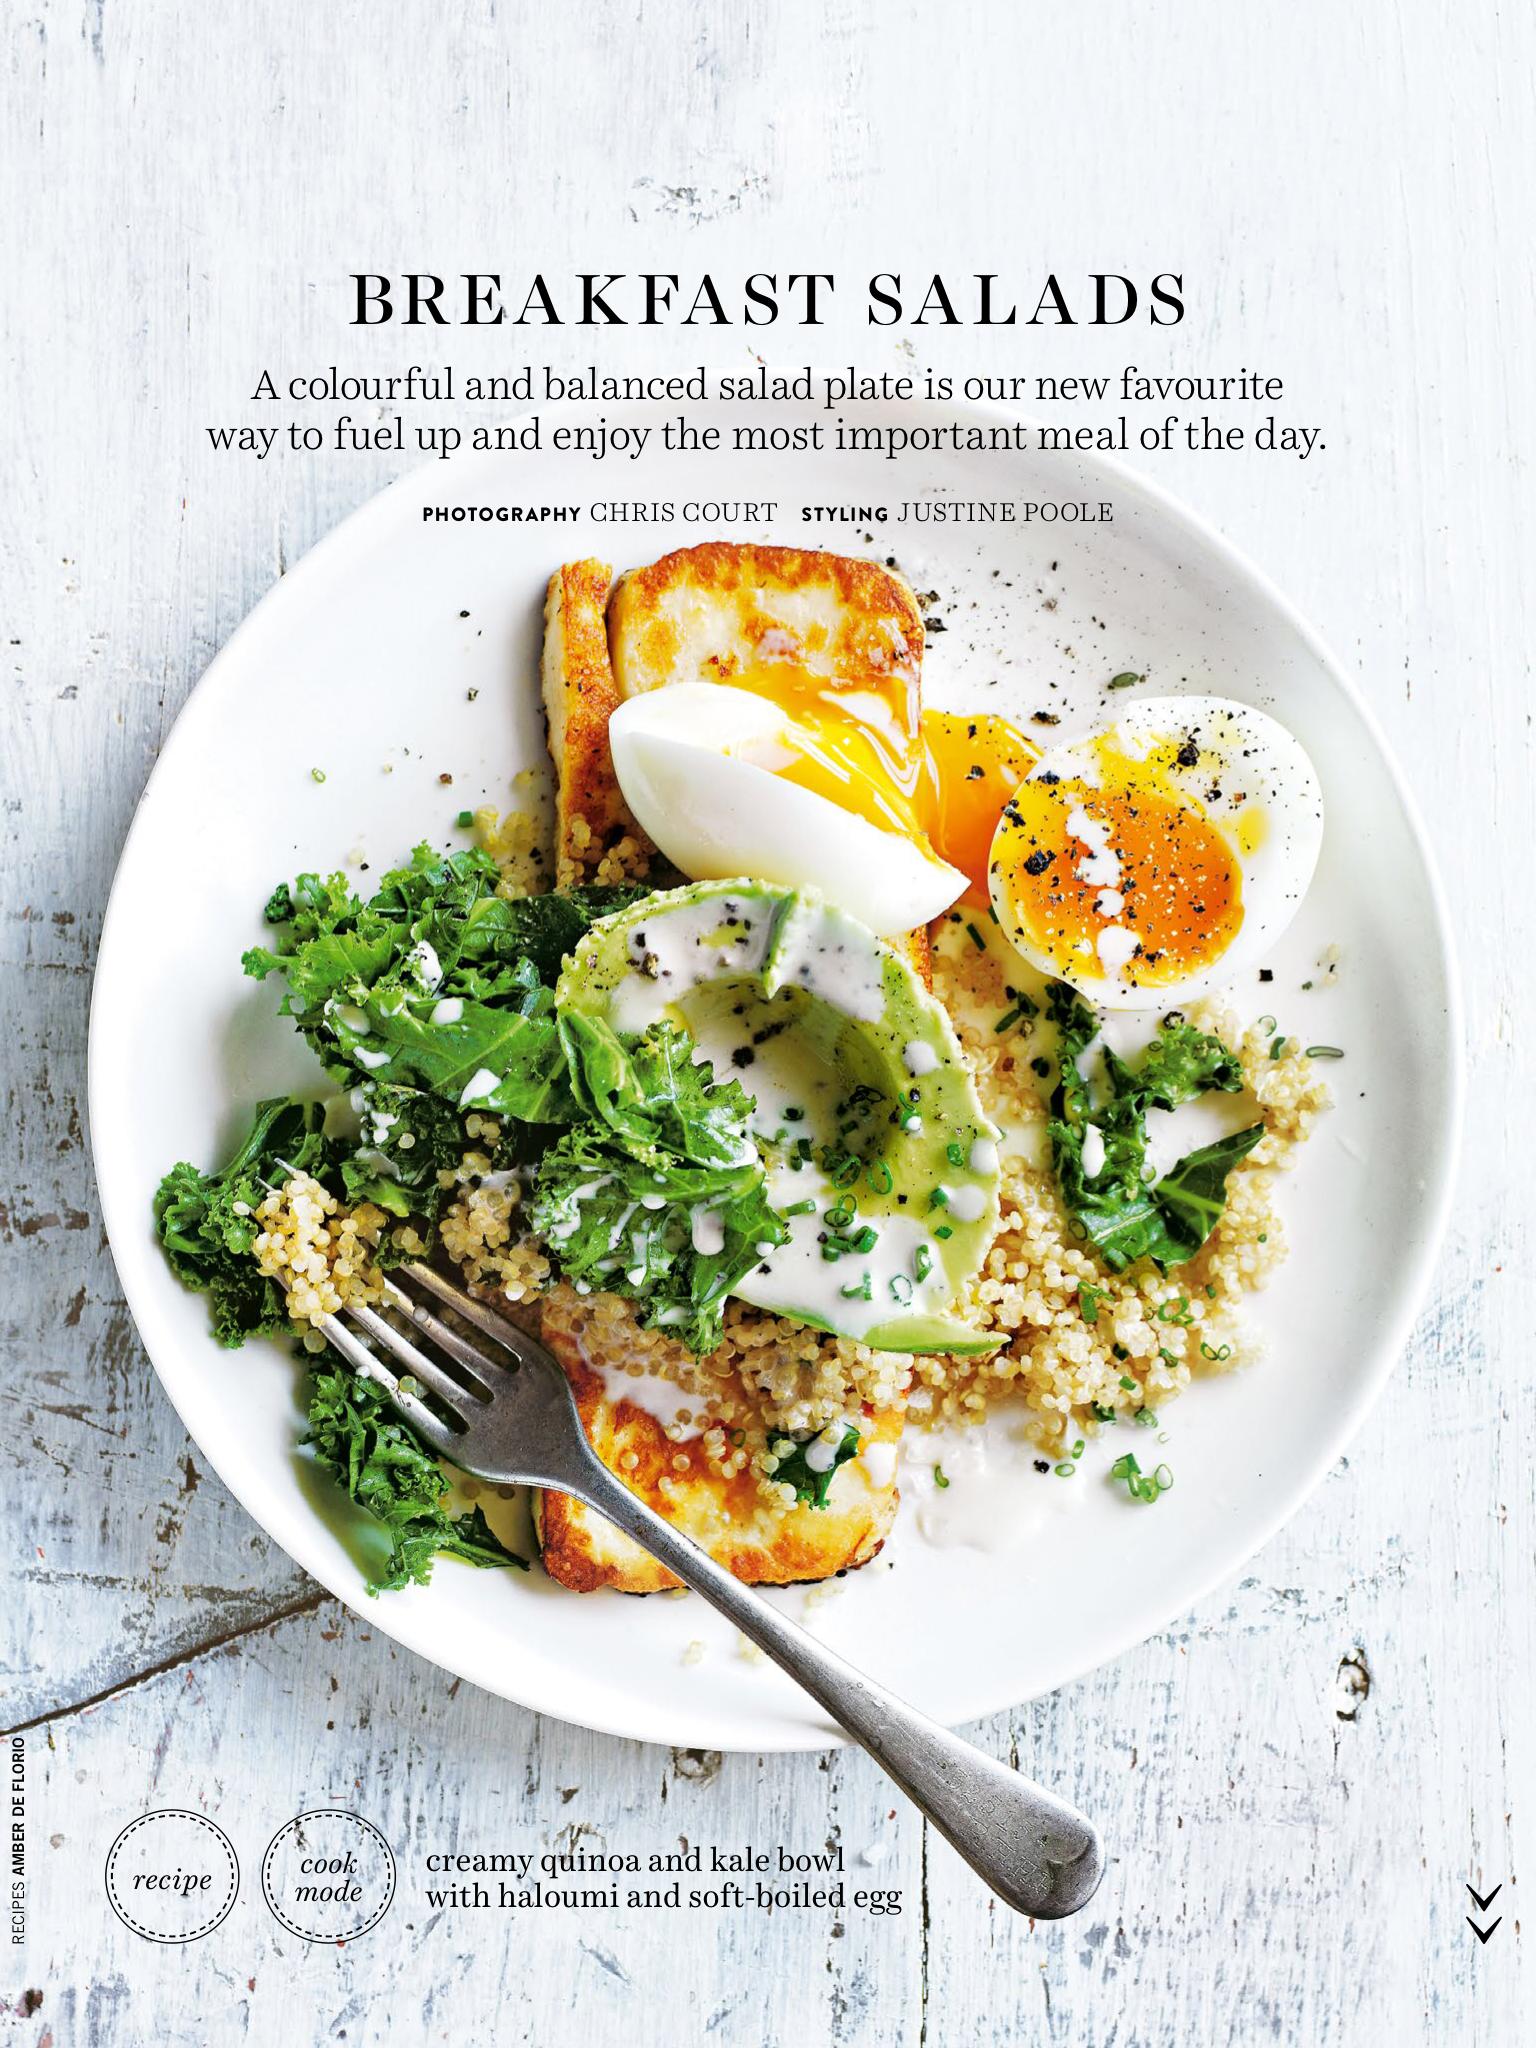 Breakfast Salad In 2020 Healthy Breakfast Recipes Meals